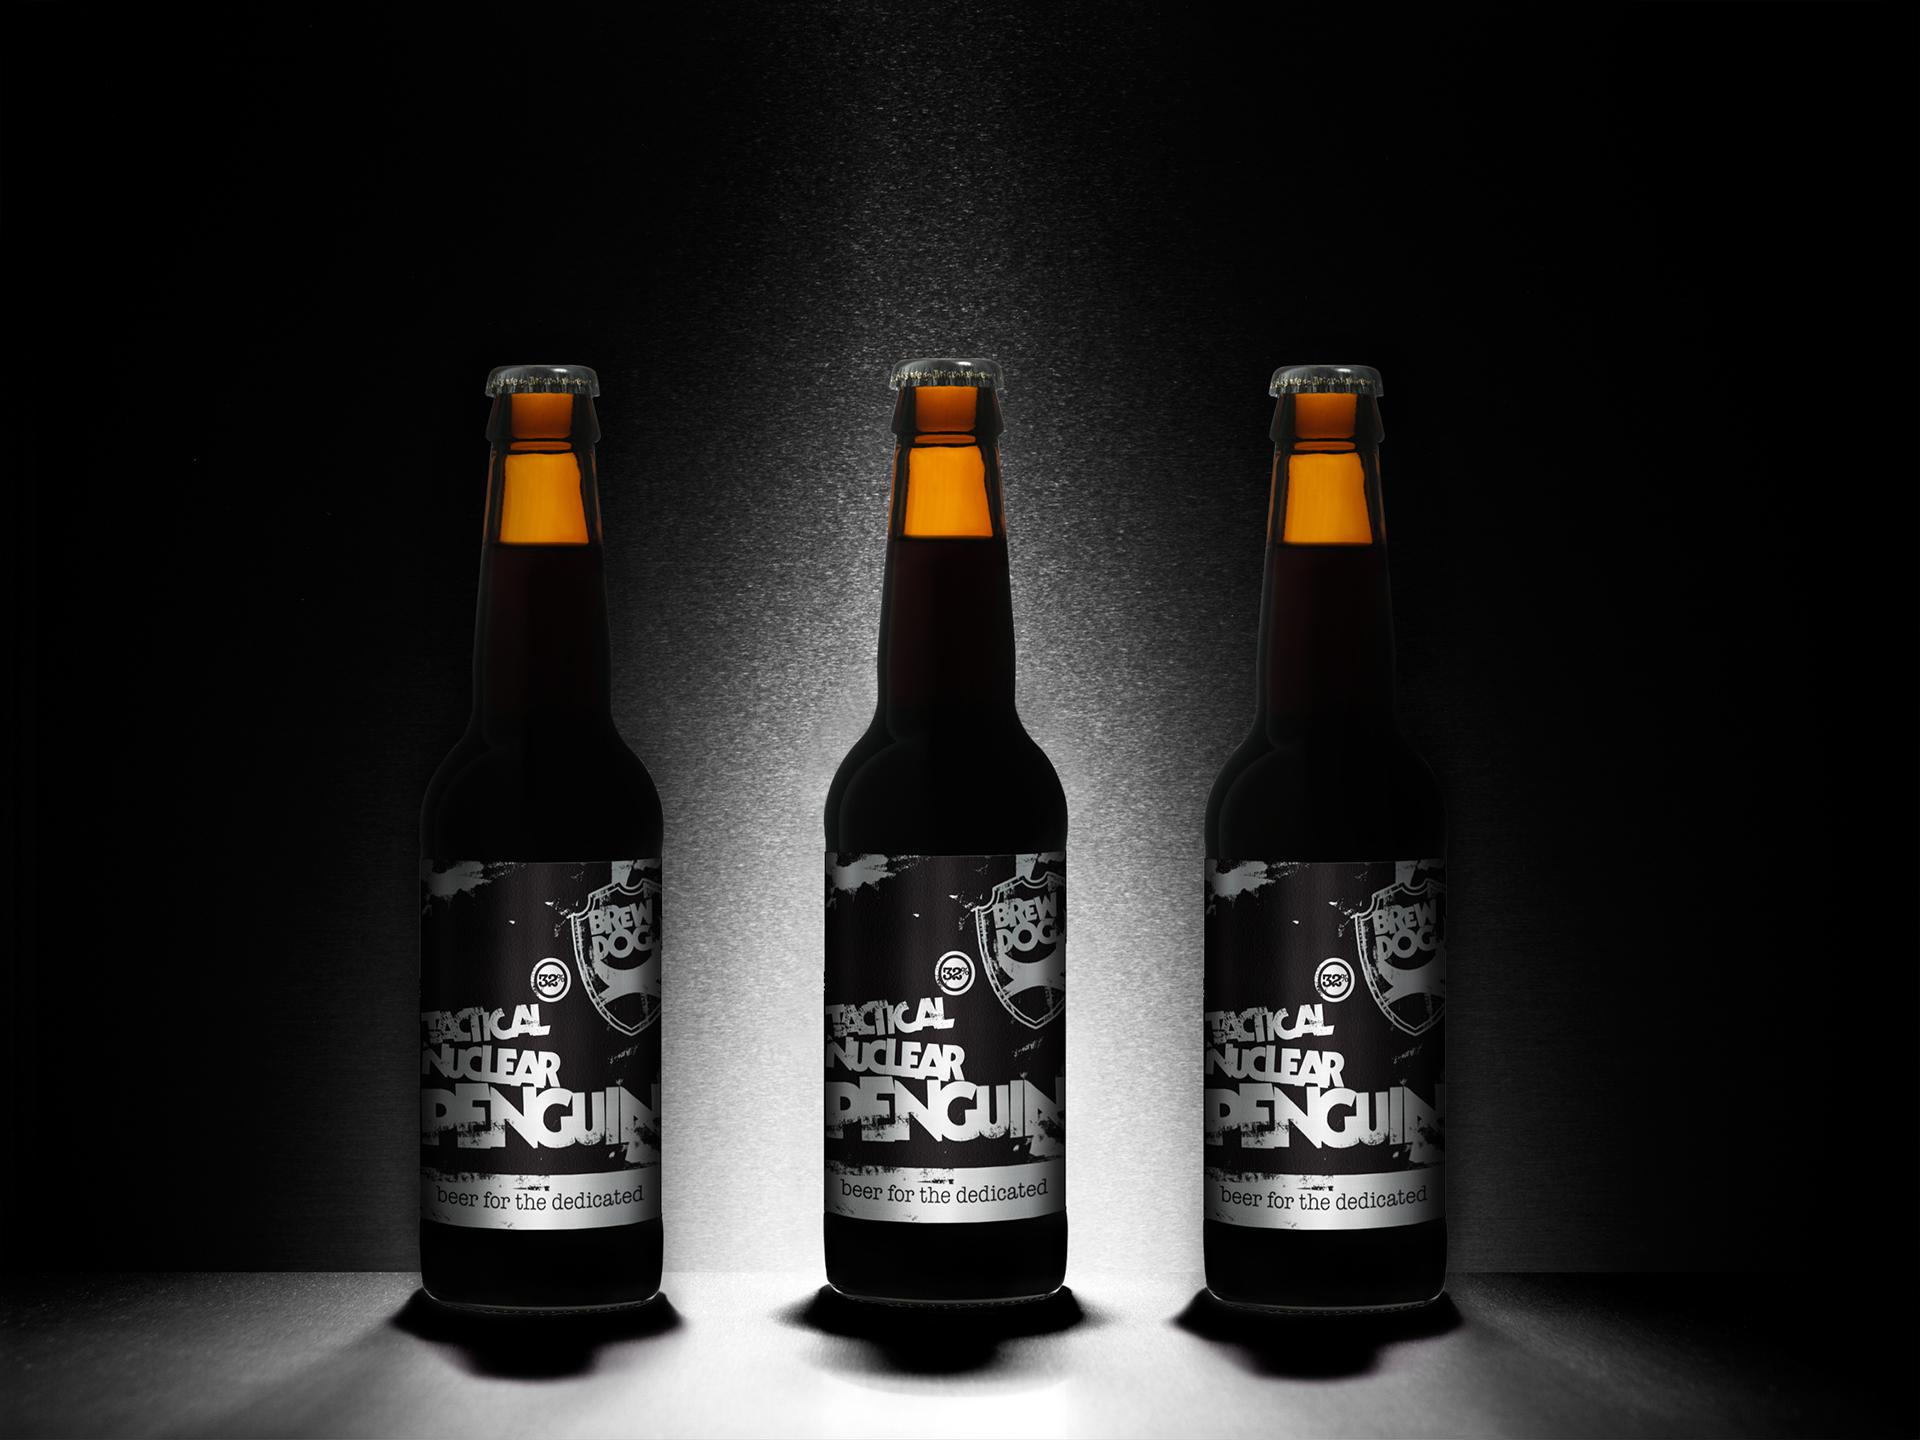 Tactical Nuclear Penguin Beer Bottles Alcohol Wallpaper